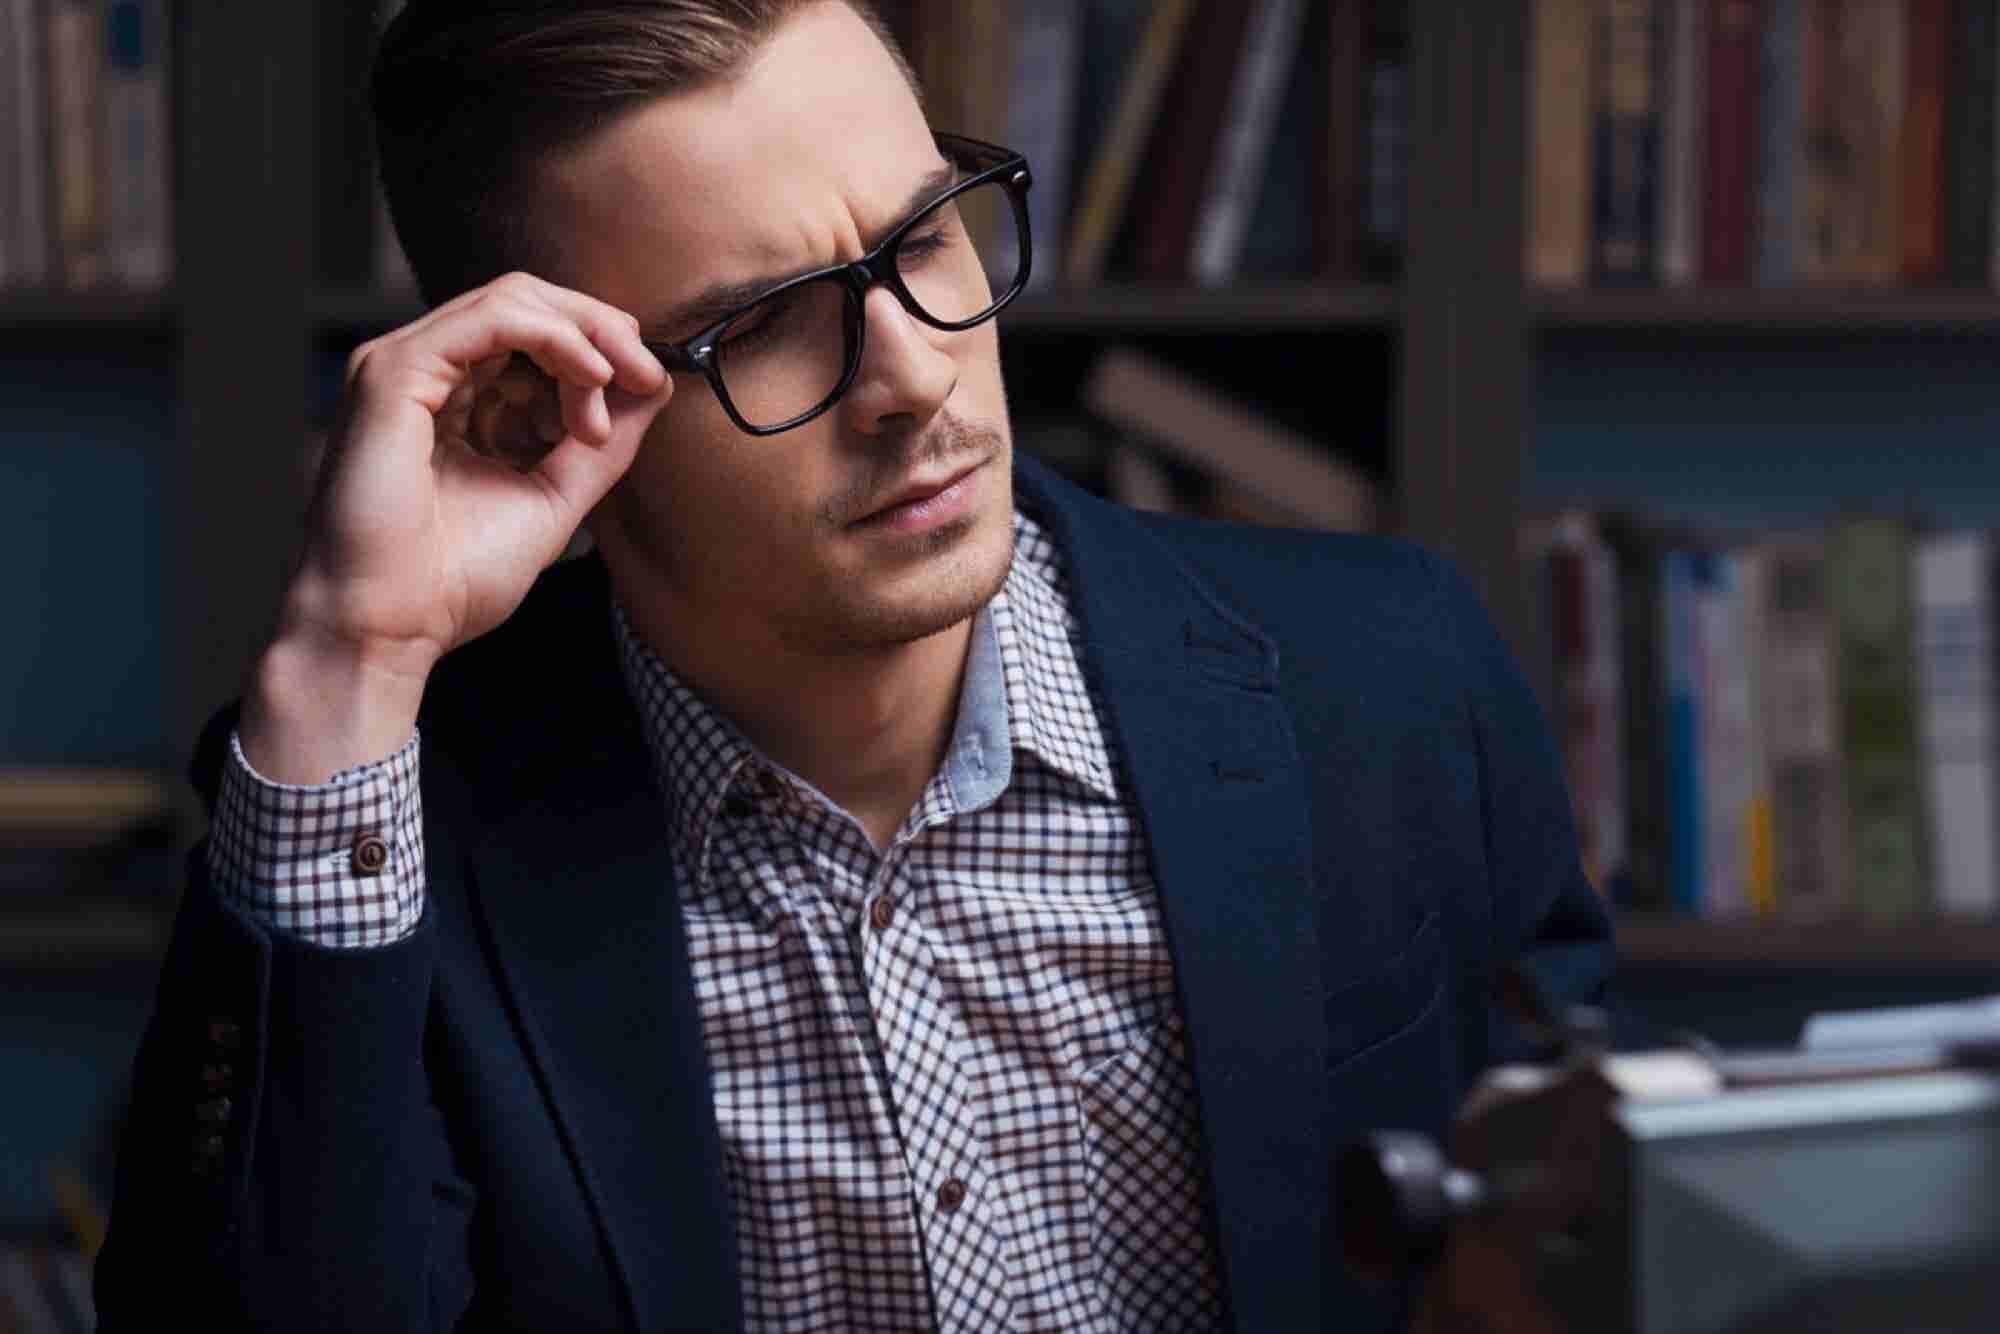 4 Ways To Push Through Adversity and Failure Without Ego